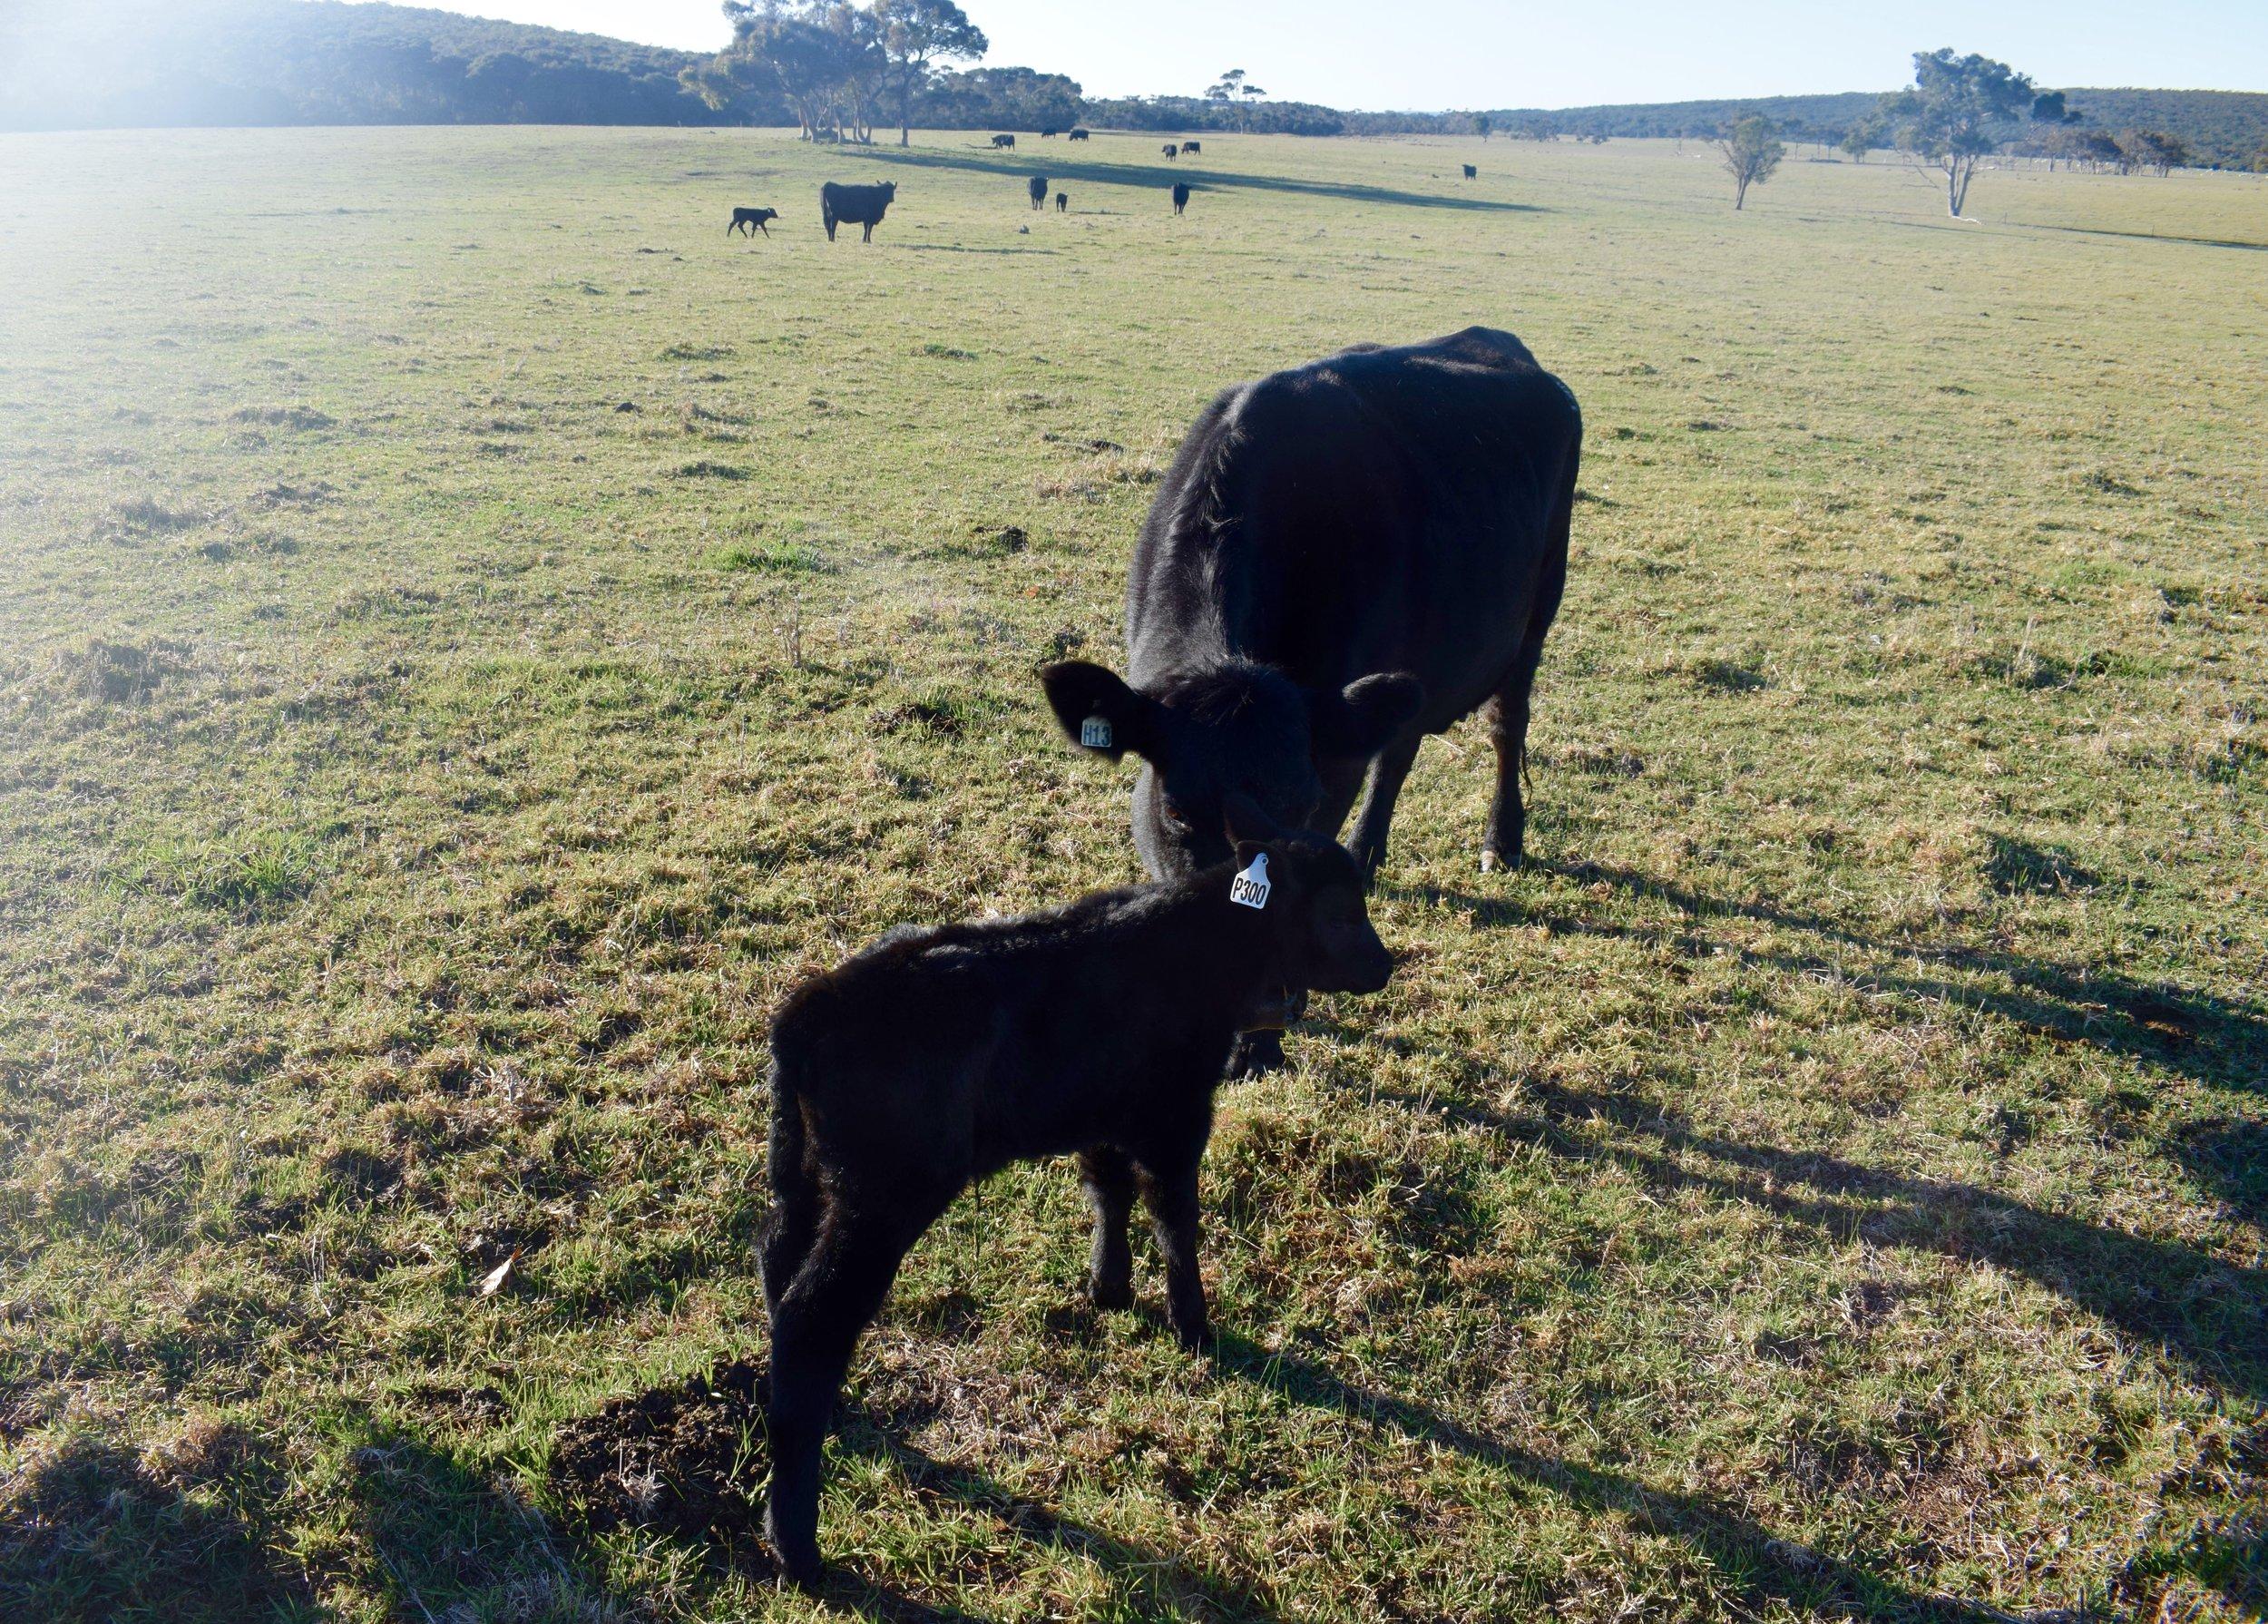 Calf number 300, a heifer weighing 37kg!